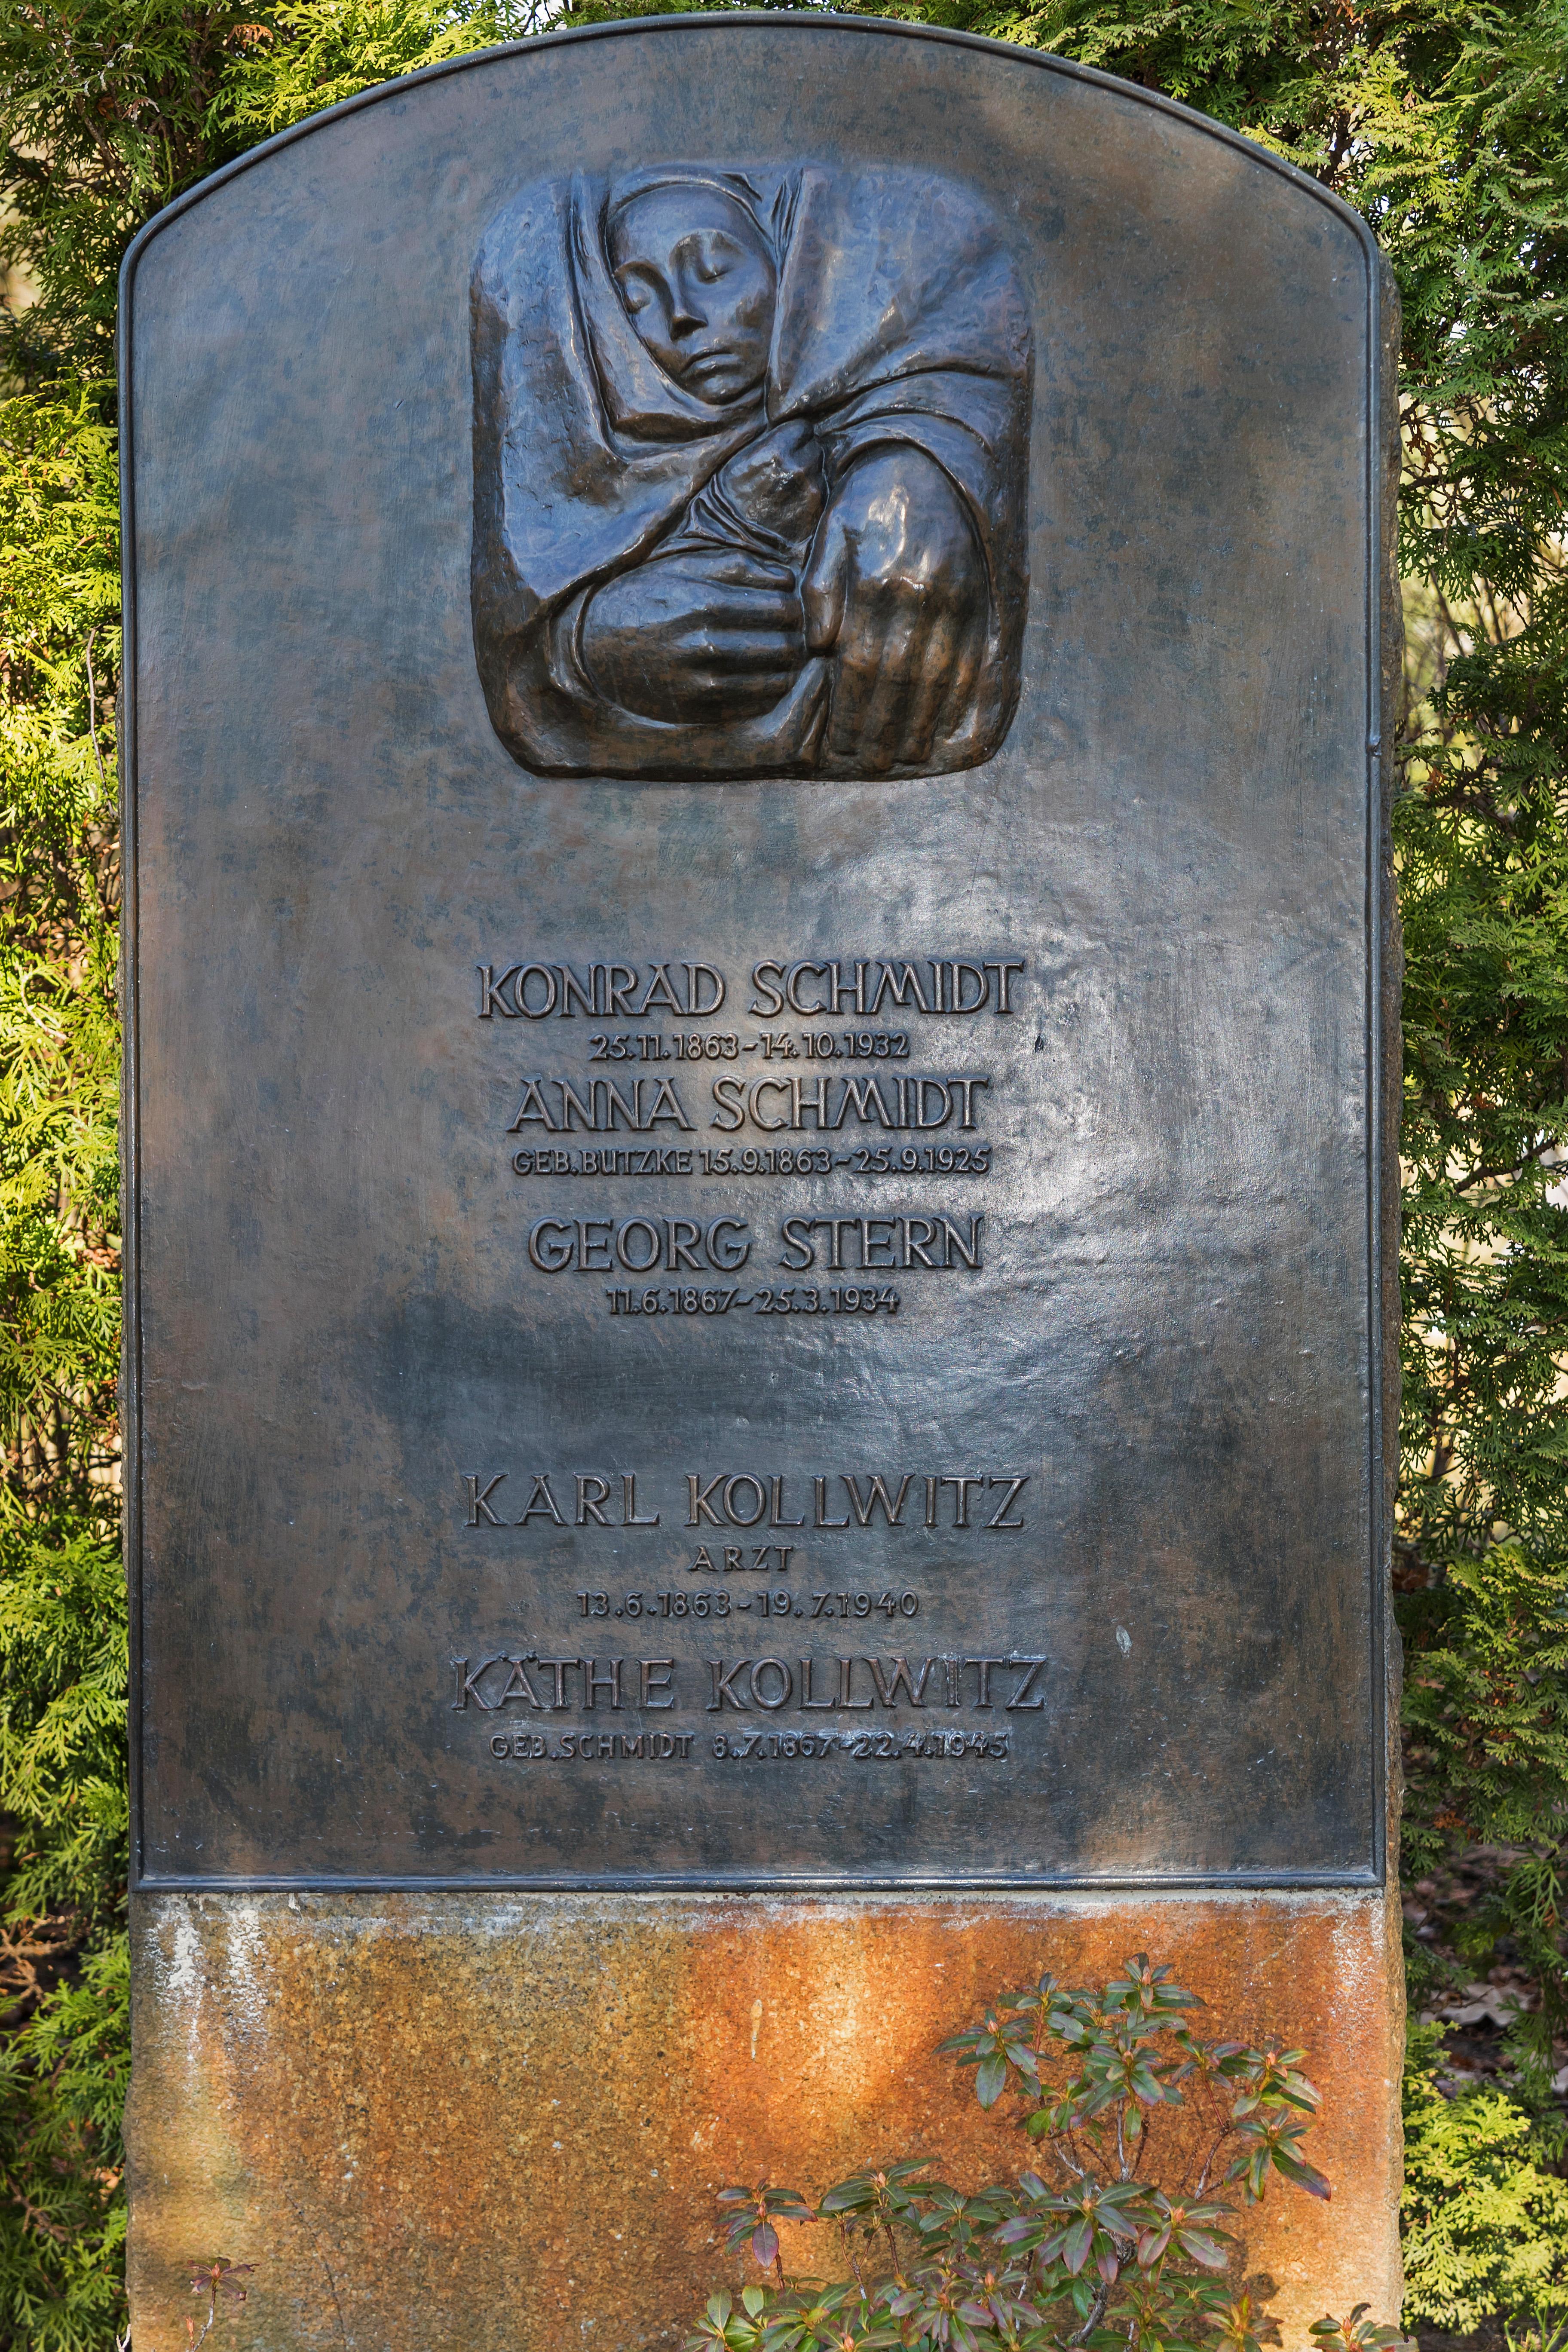 B Friedrichsfelde Zentralfriedhof 03 2015 img22 Kaethe Kollwitz